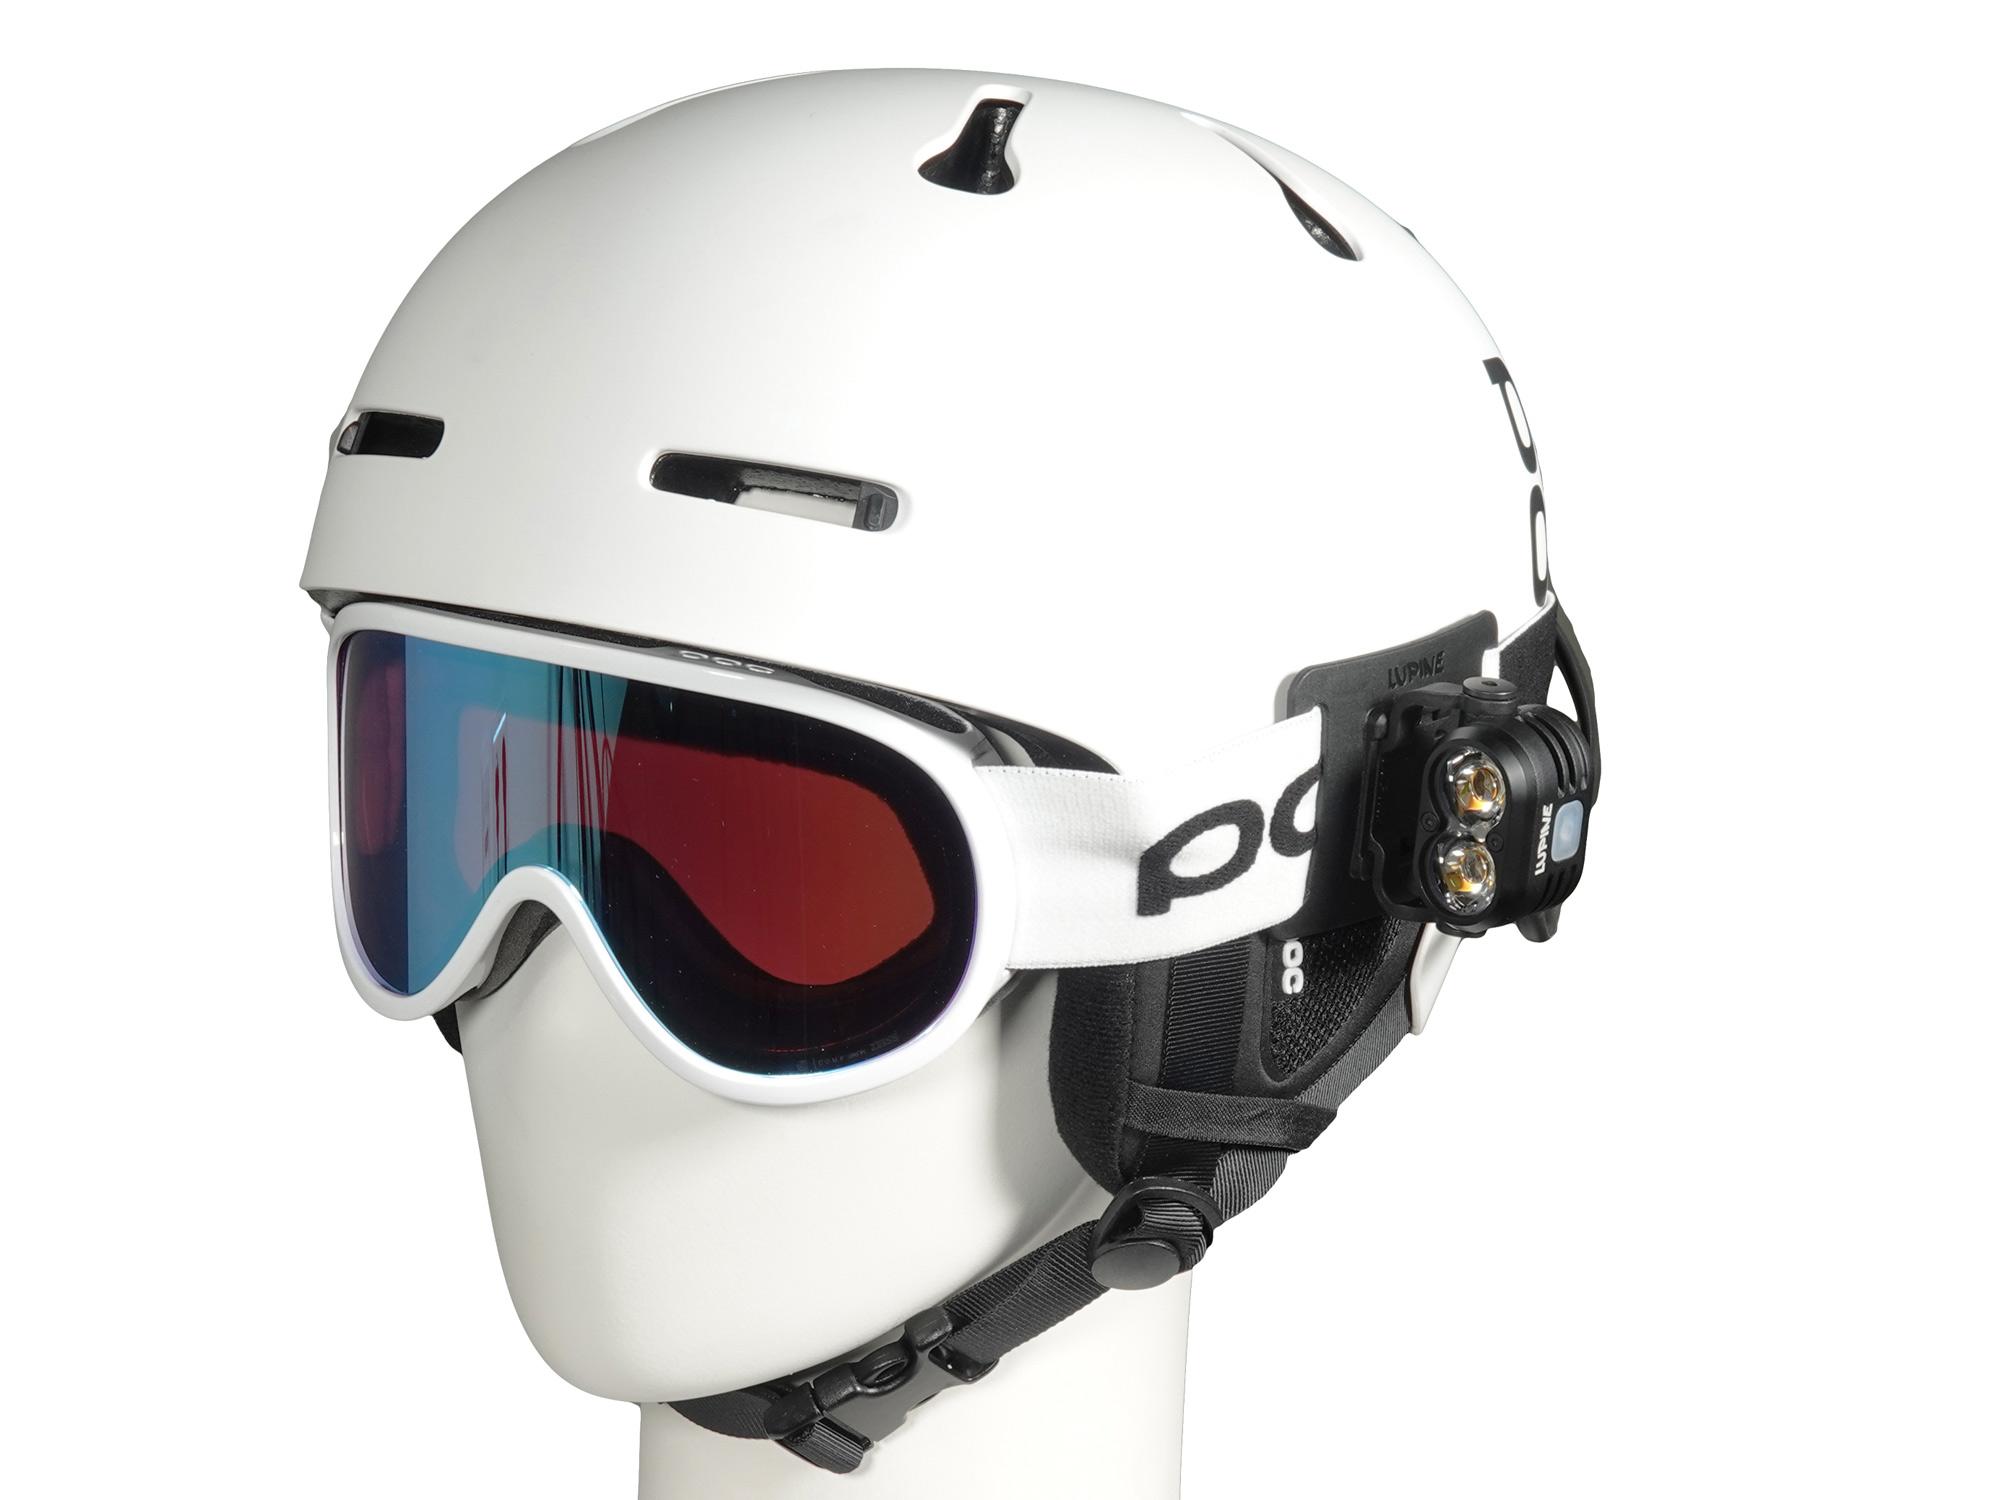 FrontClick Lampenhalter für Mtb-Goggle, Skibrille etc.